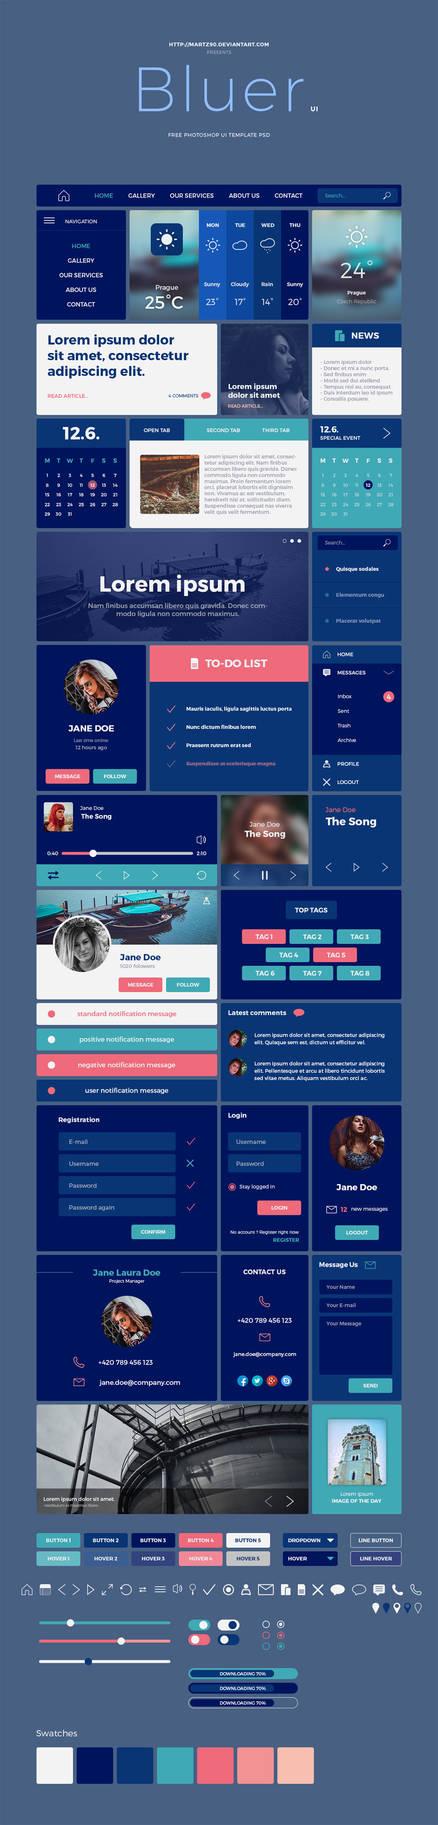 Bluer - Free UI Kit PSD